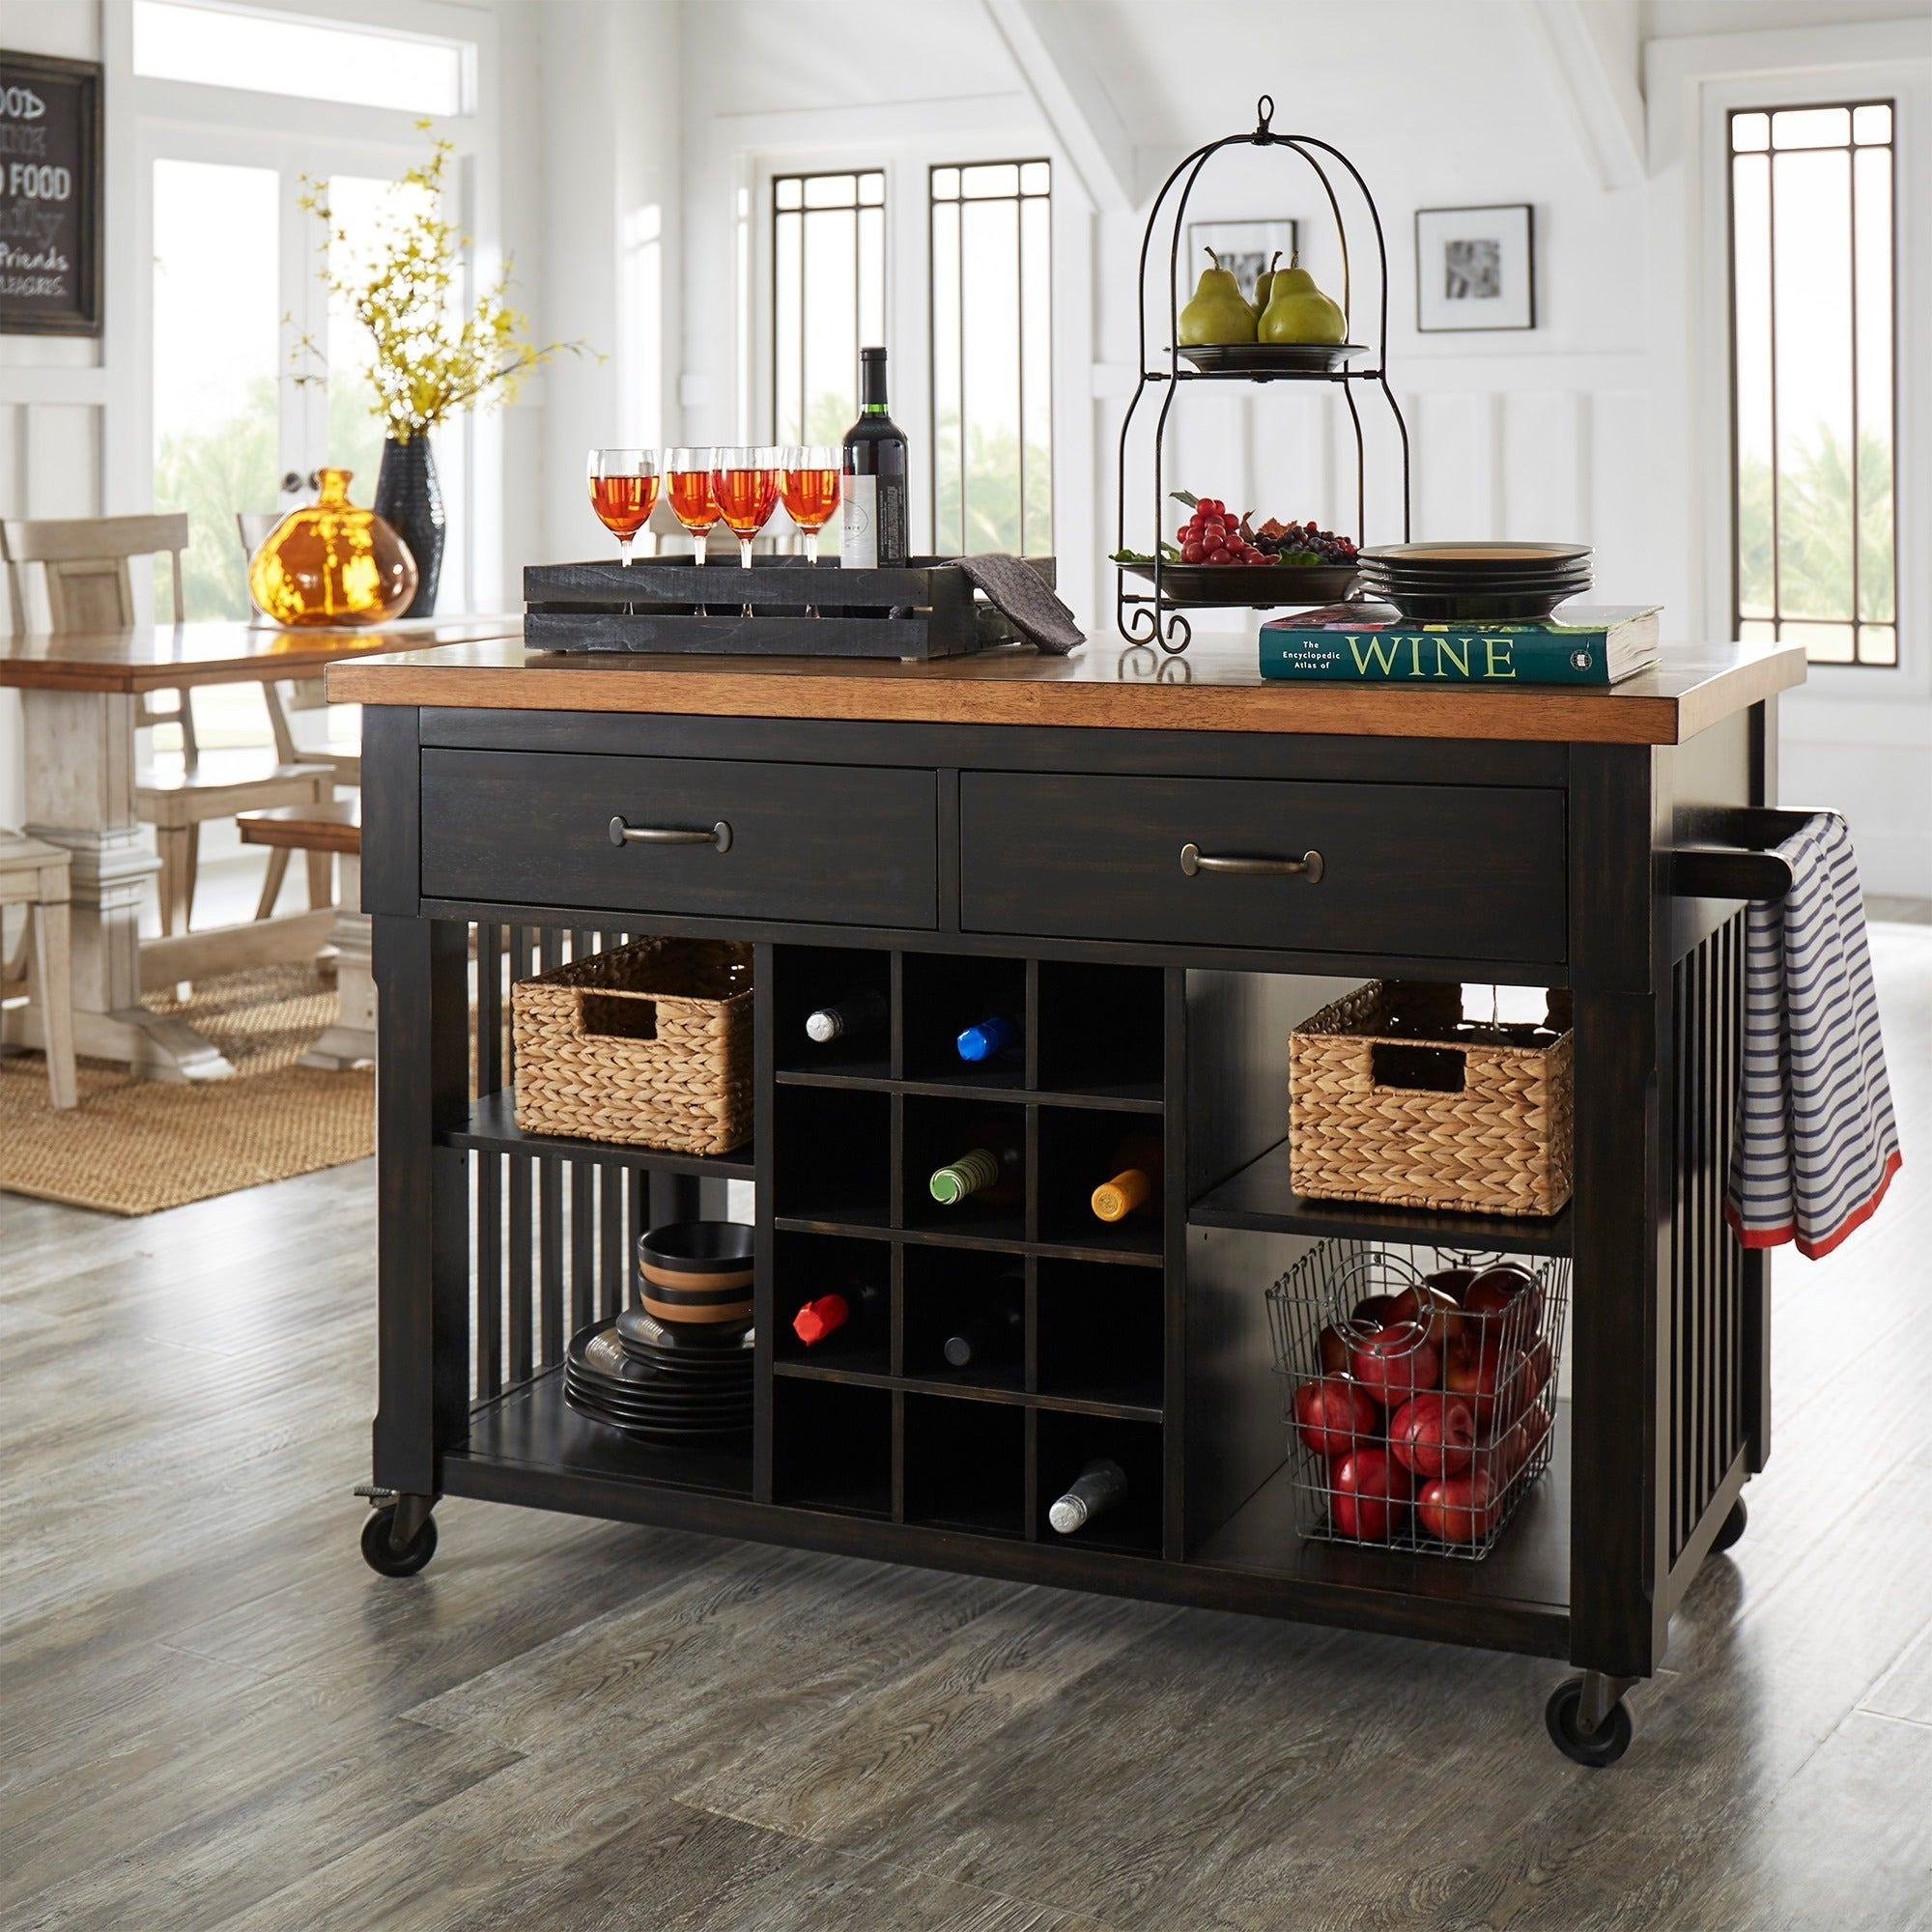 Terrific Eleanor Two Tone Kitchen Island With Wine Rack By Inspire Q Classic Download Free Architecture Designs Itiscsunscenecom